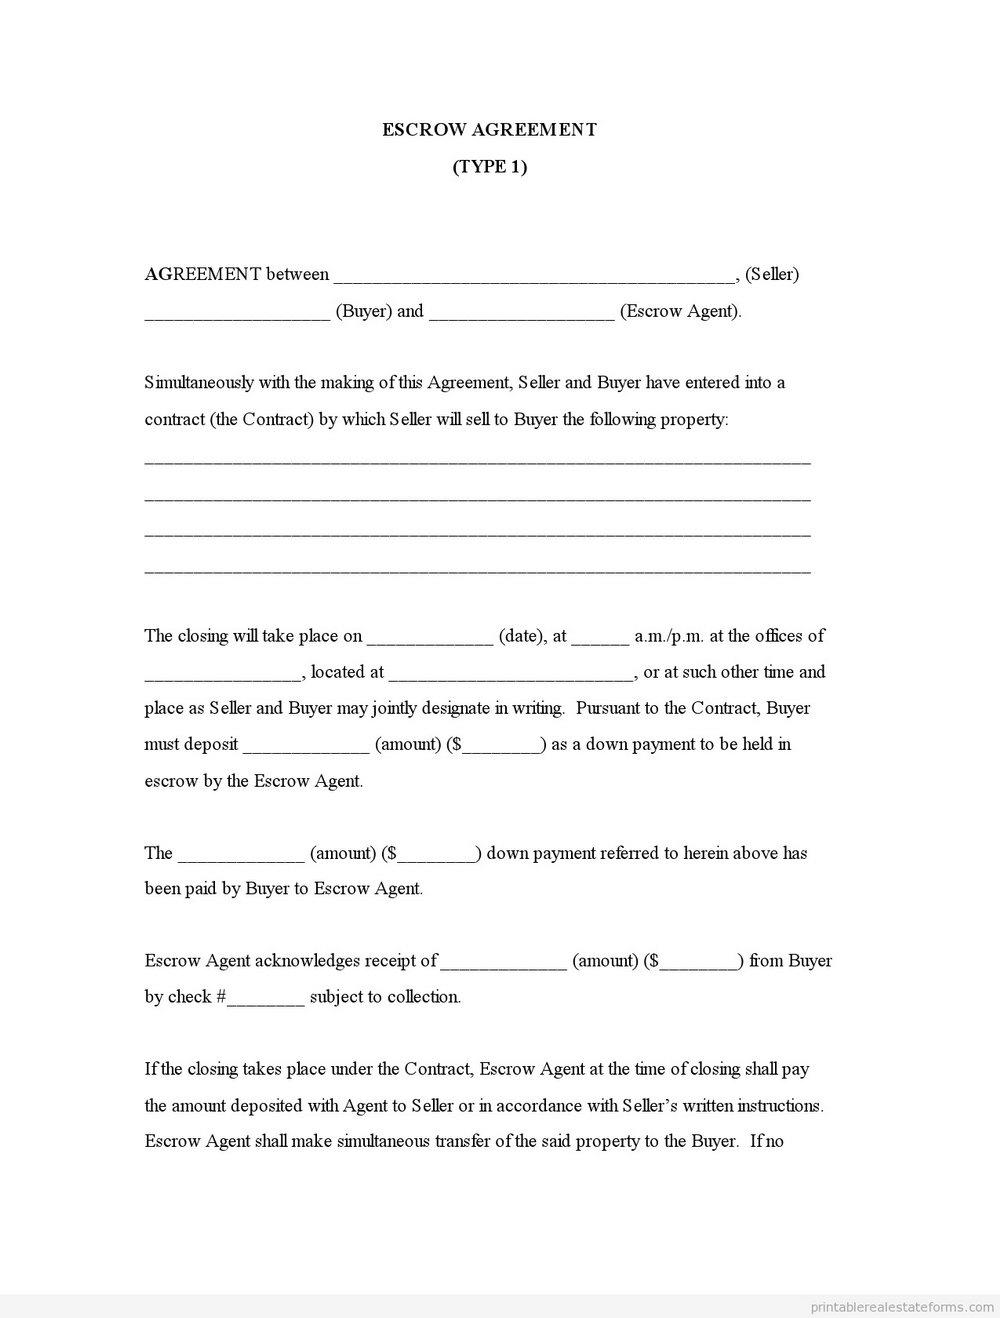 Escrow Agreement Form